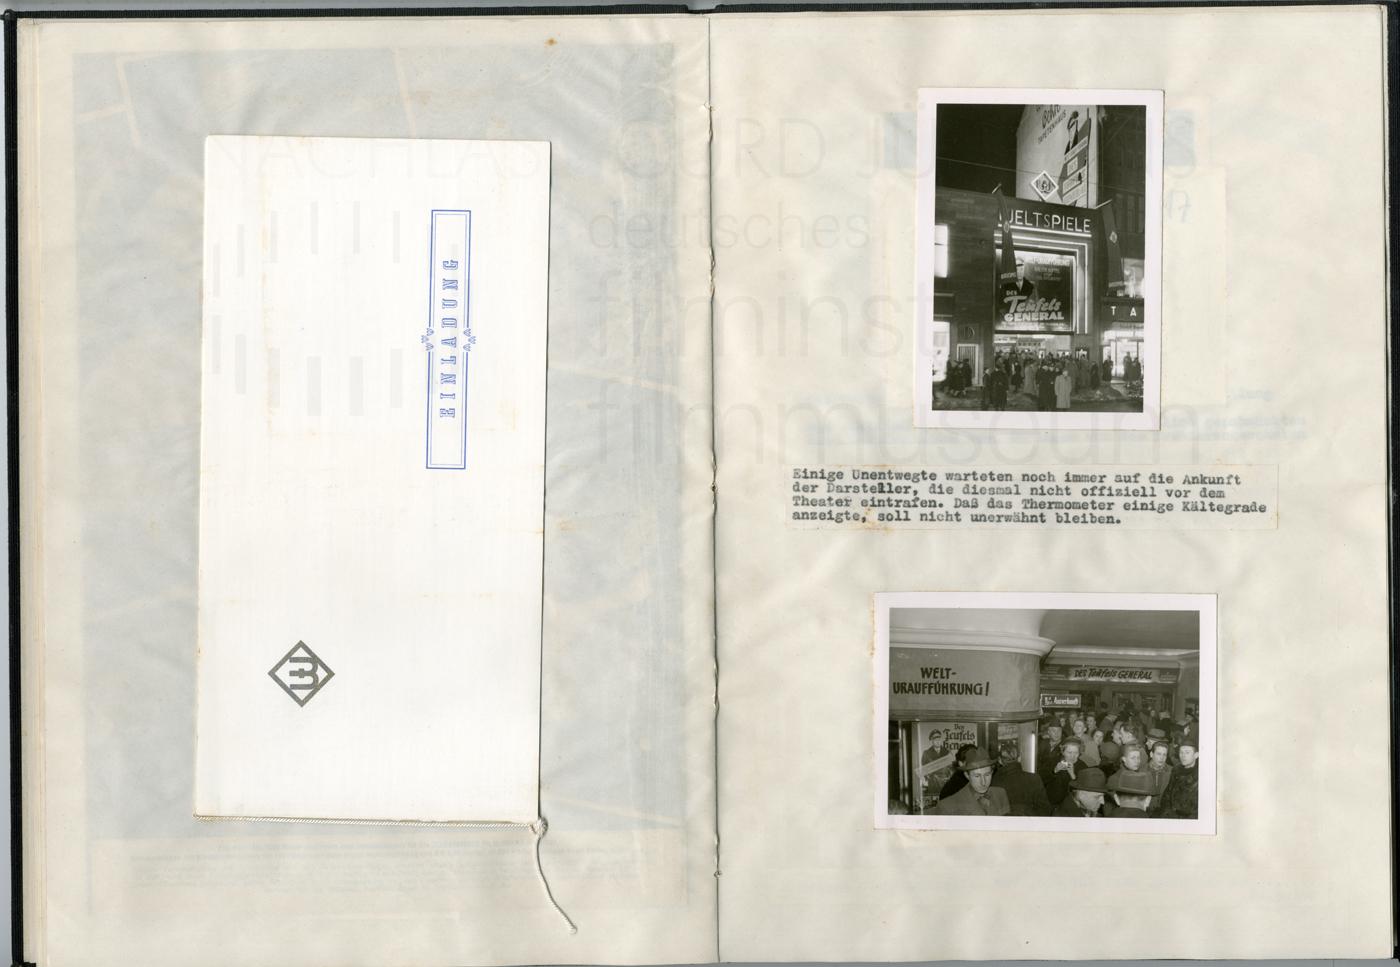 DES TEUFELS GENERAL (1955) Dokumentation der Werbemaßahmen, 23.2.1955, Hannover (Weltspiele)